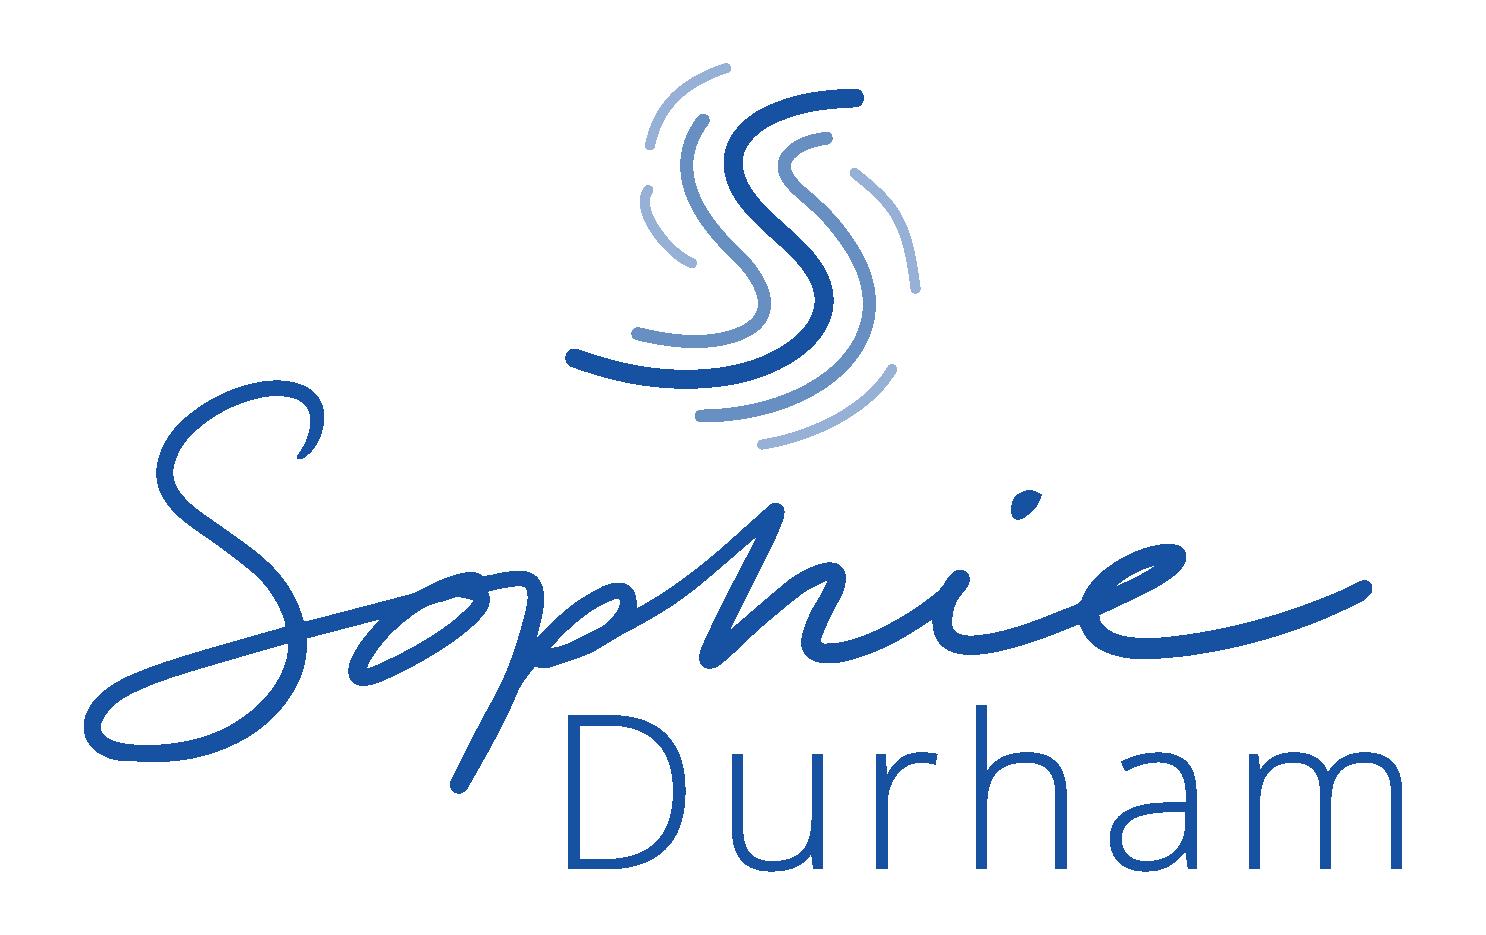 Sophie Durham